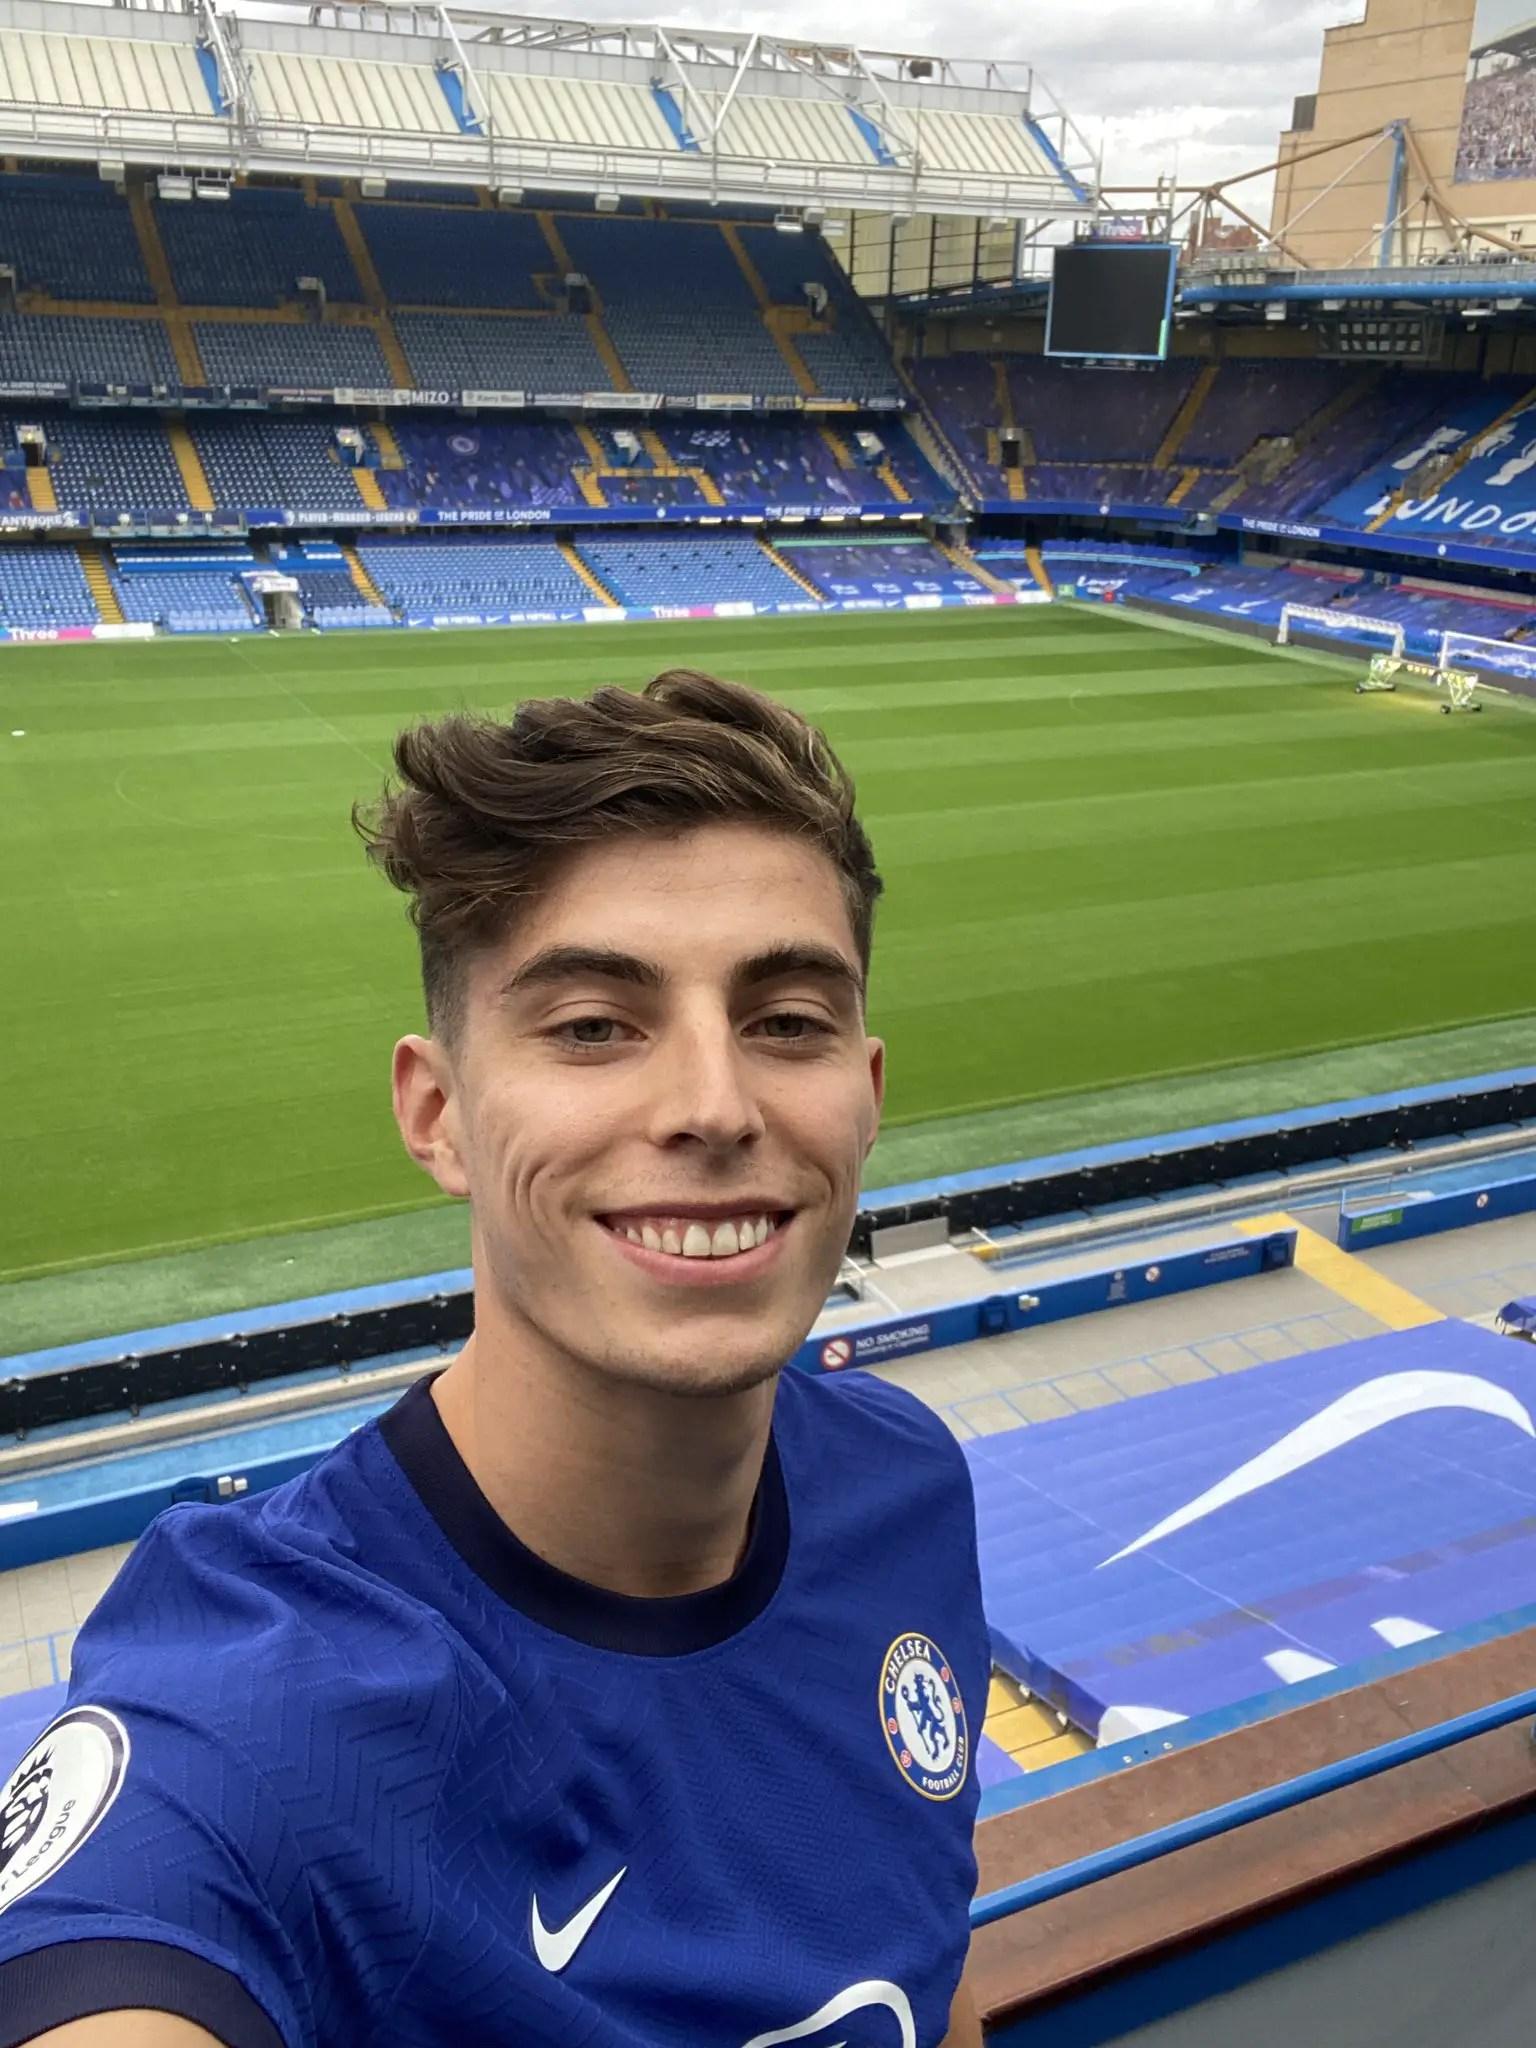 Havertz: Joining Chelsea Is Dream Come True